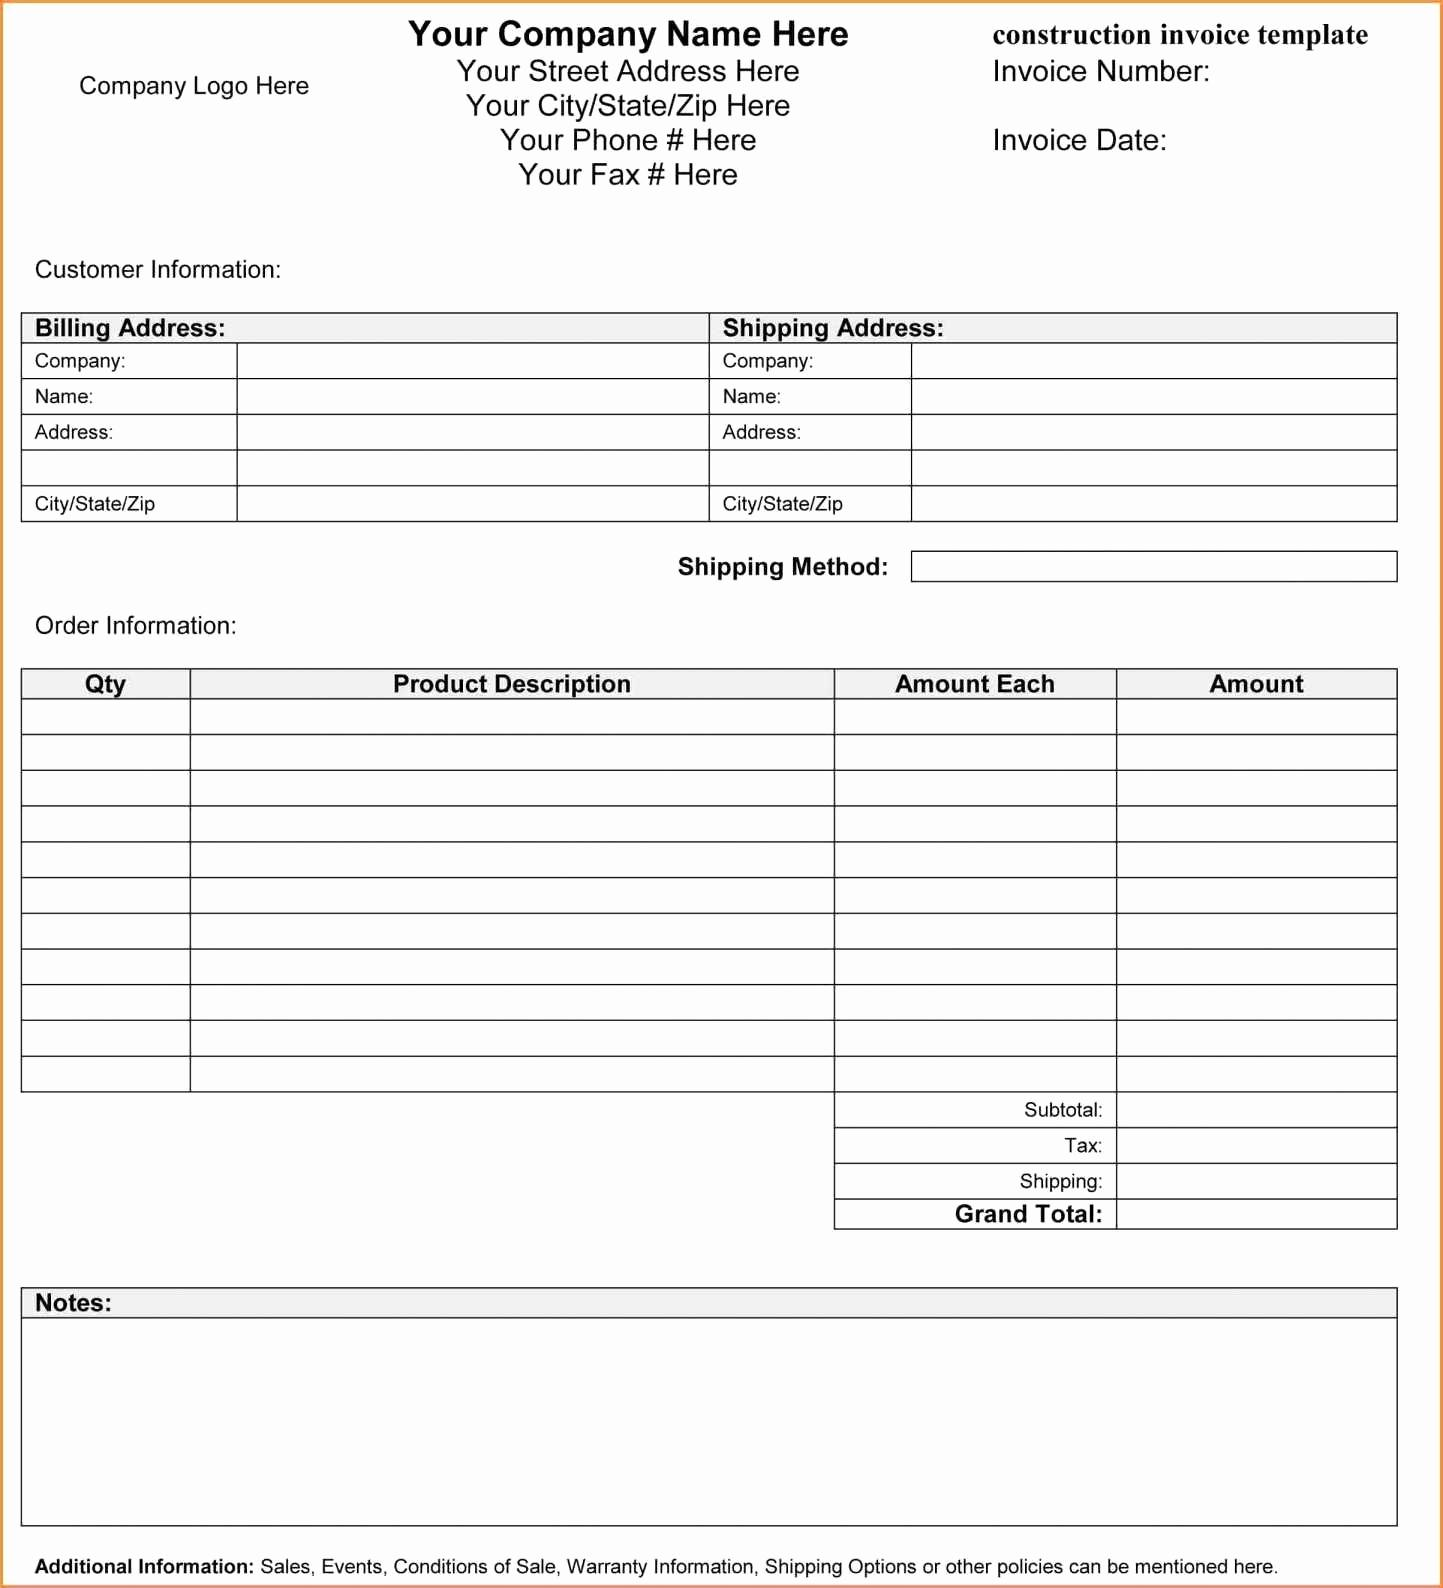 Construction Invoice Template Xls